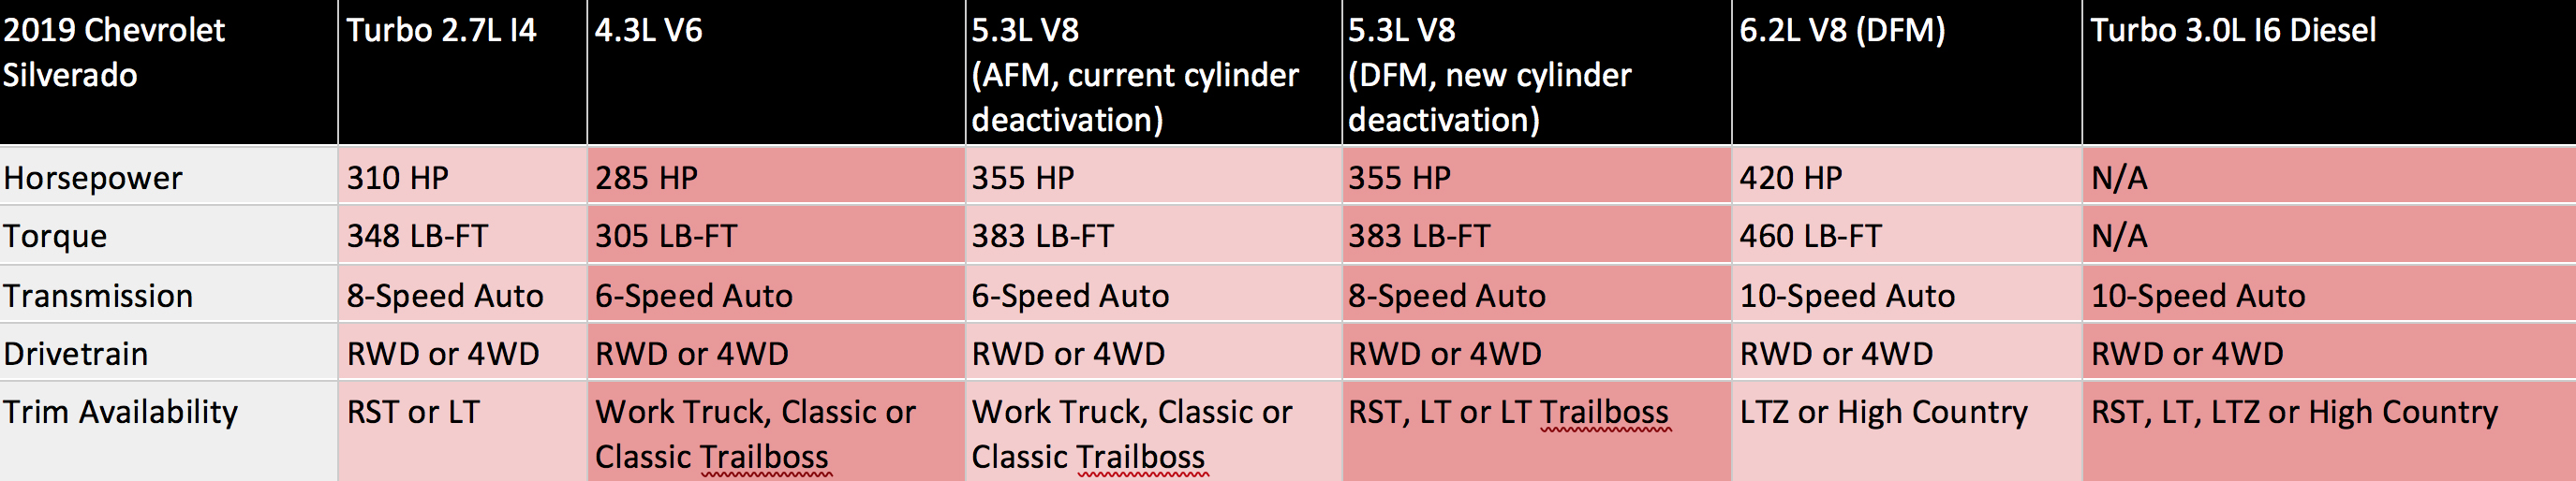 2019 Chevy Silverado powertrain chart